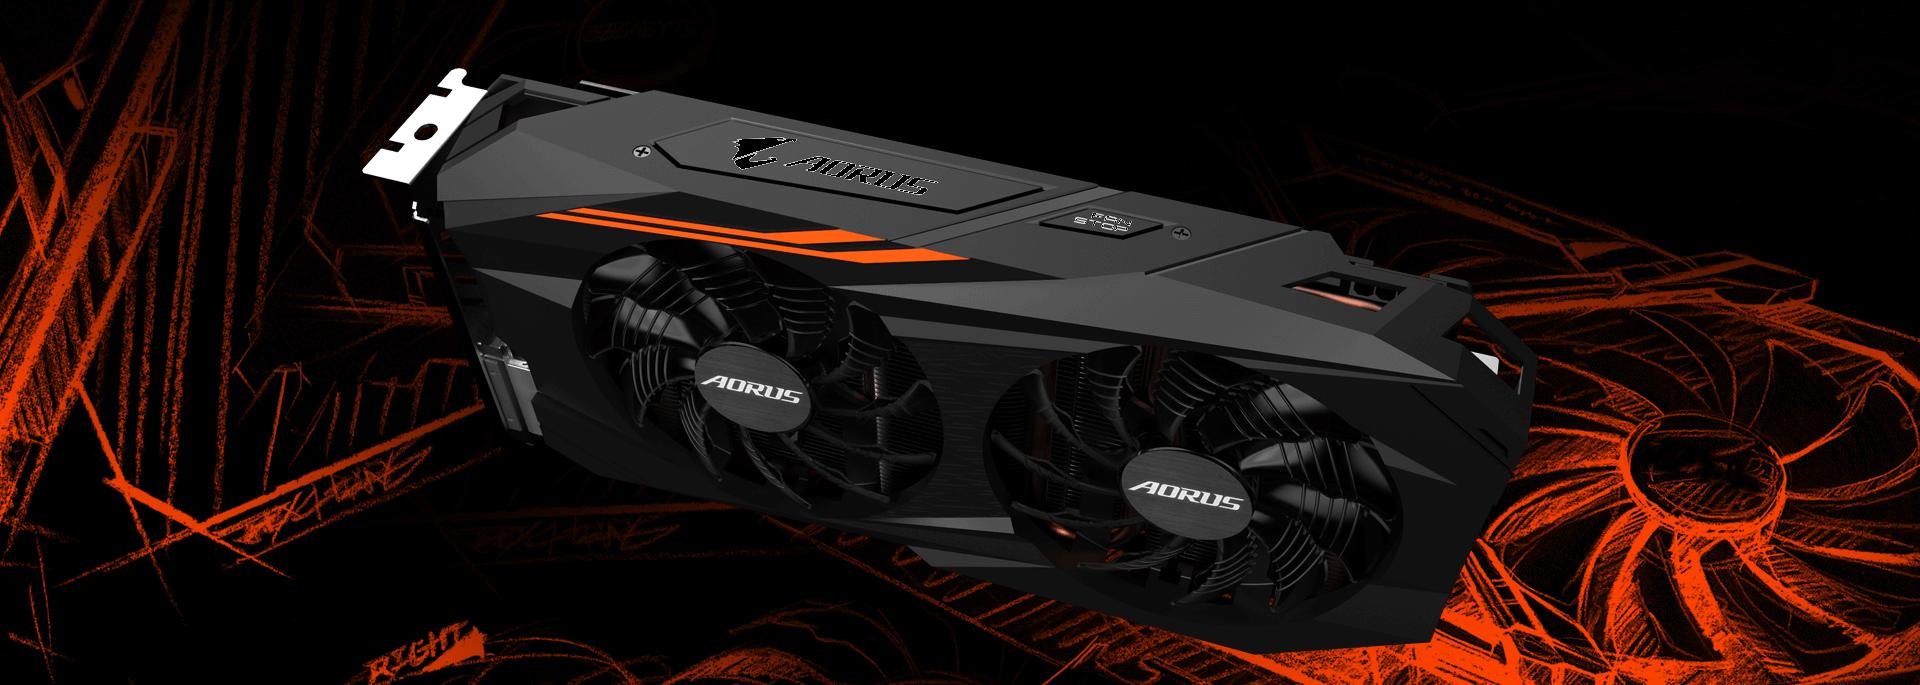 AORUS Radeon™ RX580 8G (rev  1 0/1 1) | Graphics Card - GIGABYTE Global